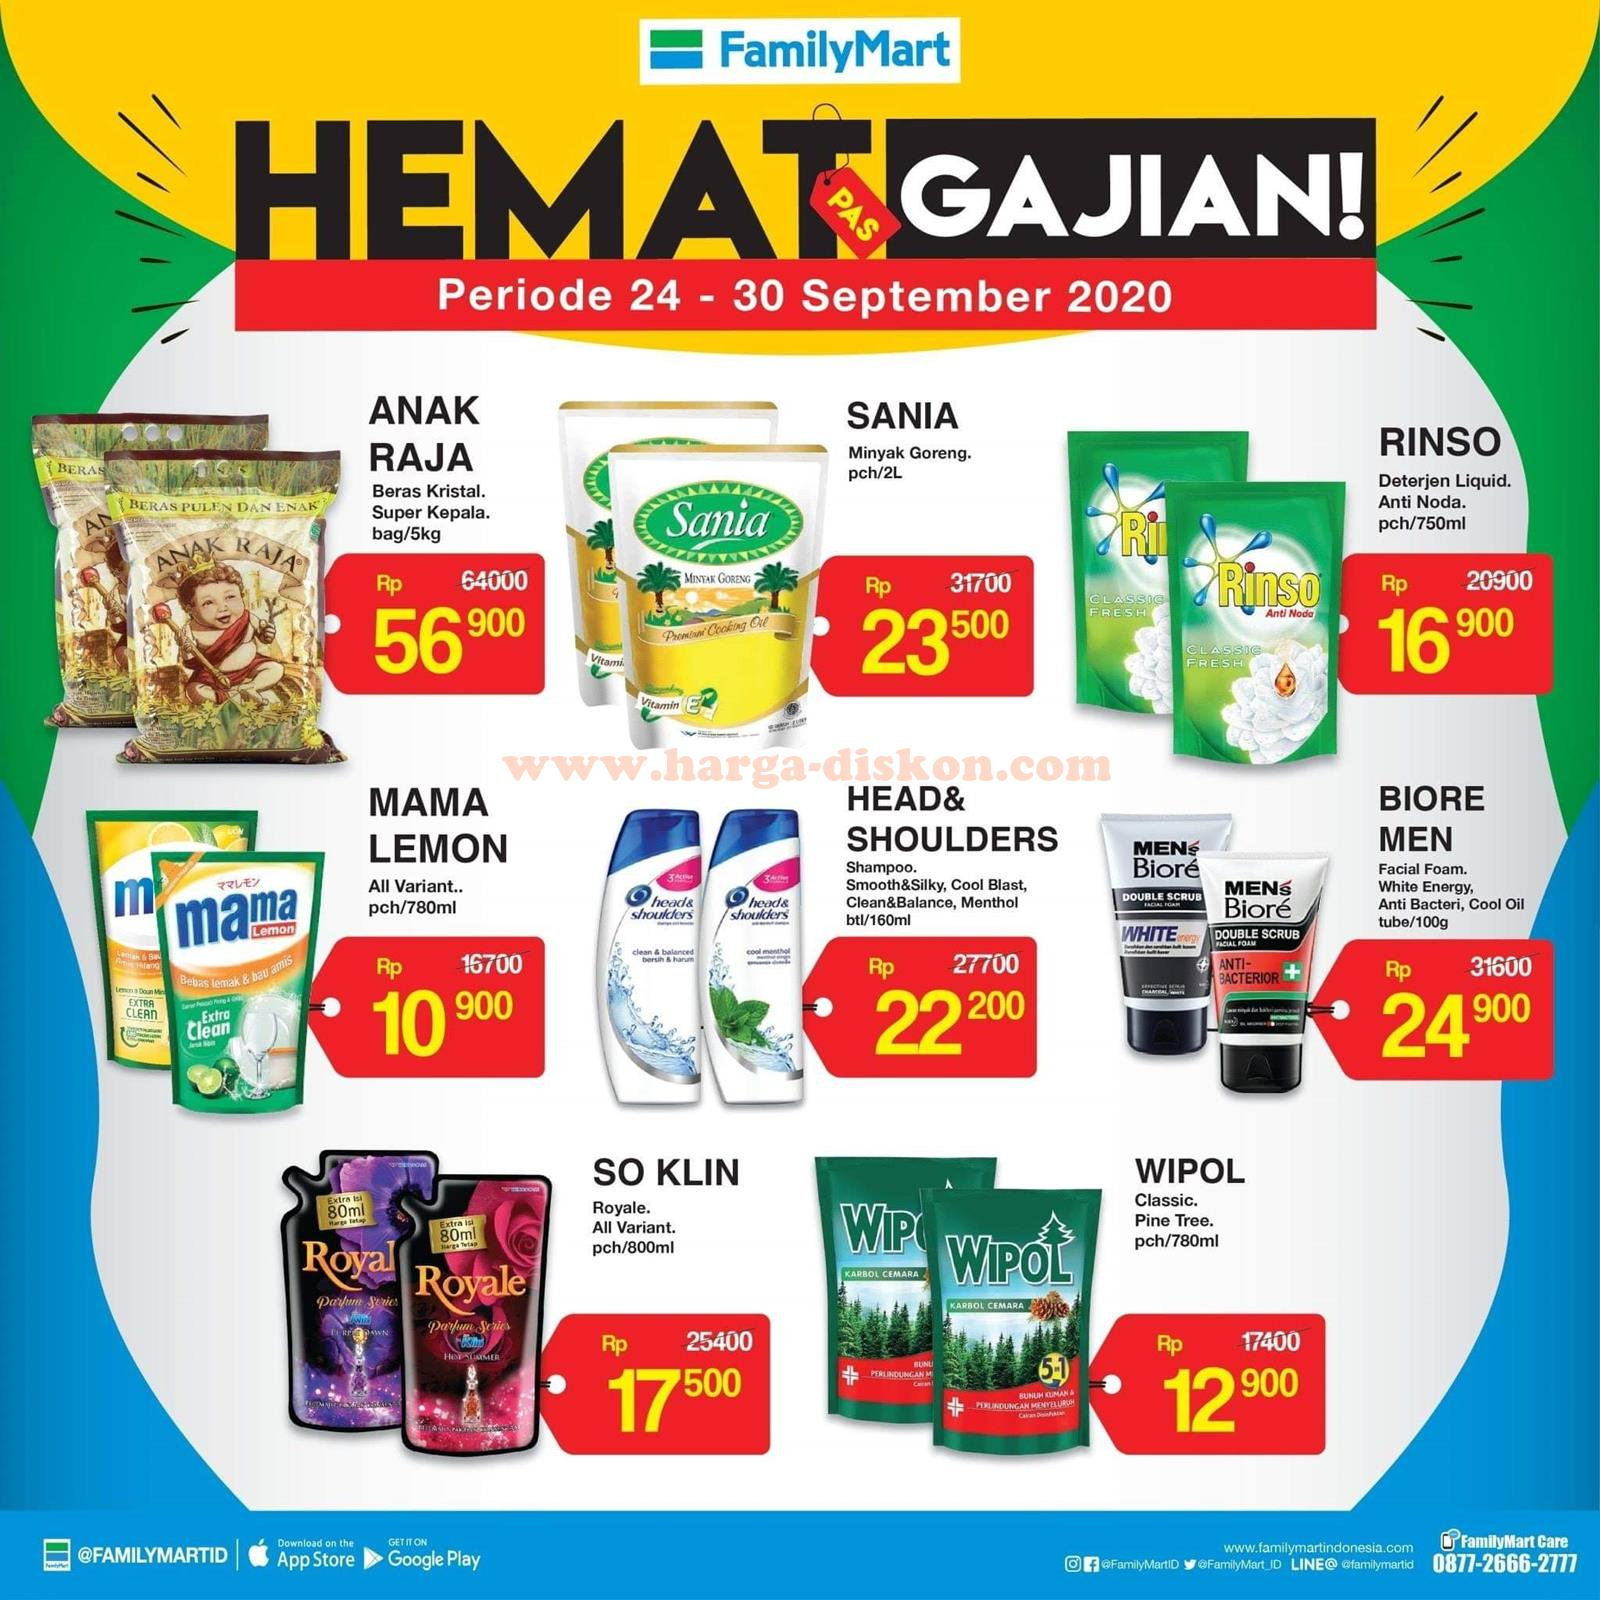 Promo Family Mart Terbaru Hemat Gajian Periode 24 30 September 2020 Harga Diskon